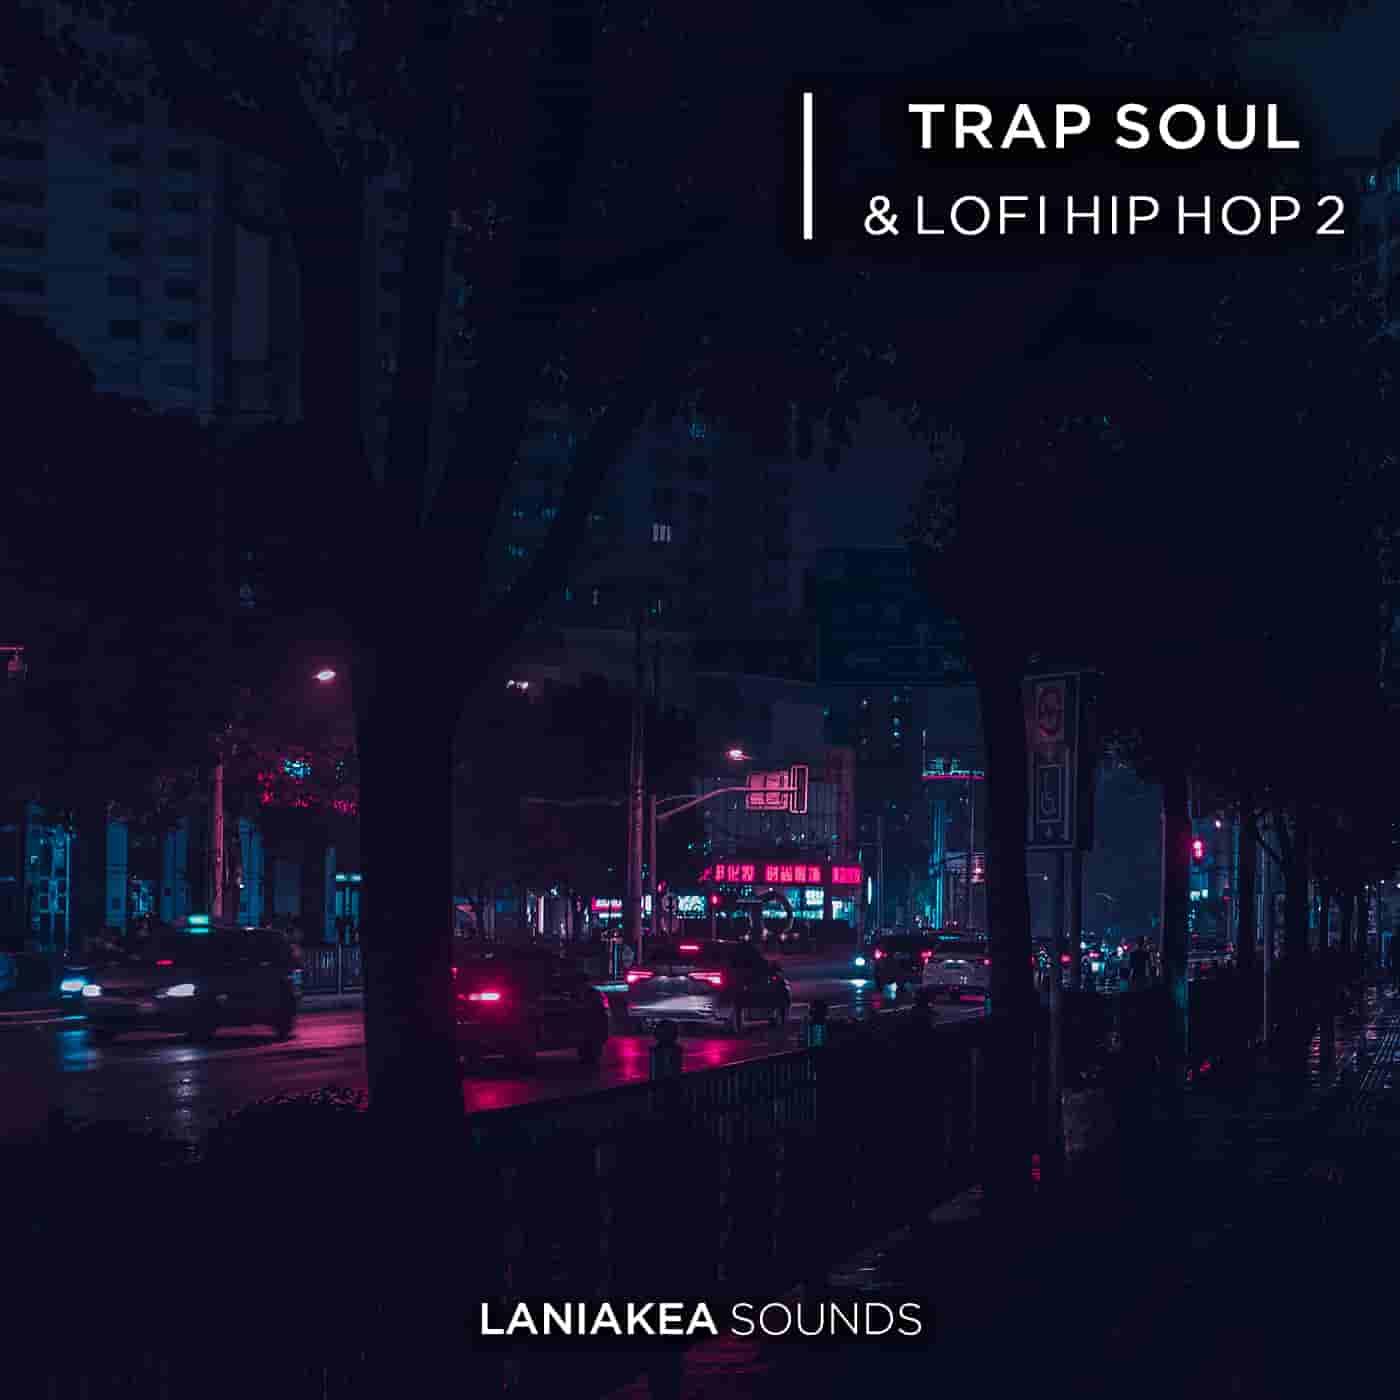 Trap Soul & Lo-Fi Hip-Hop 2